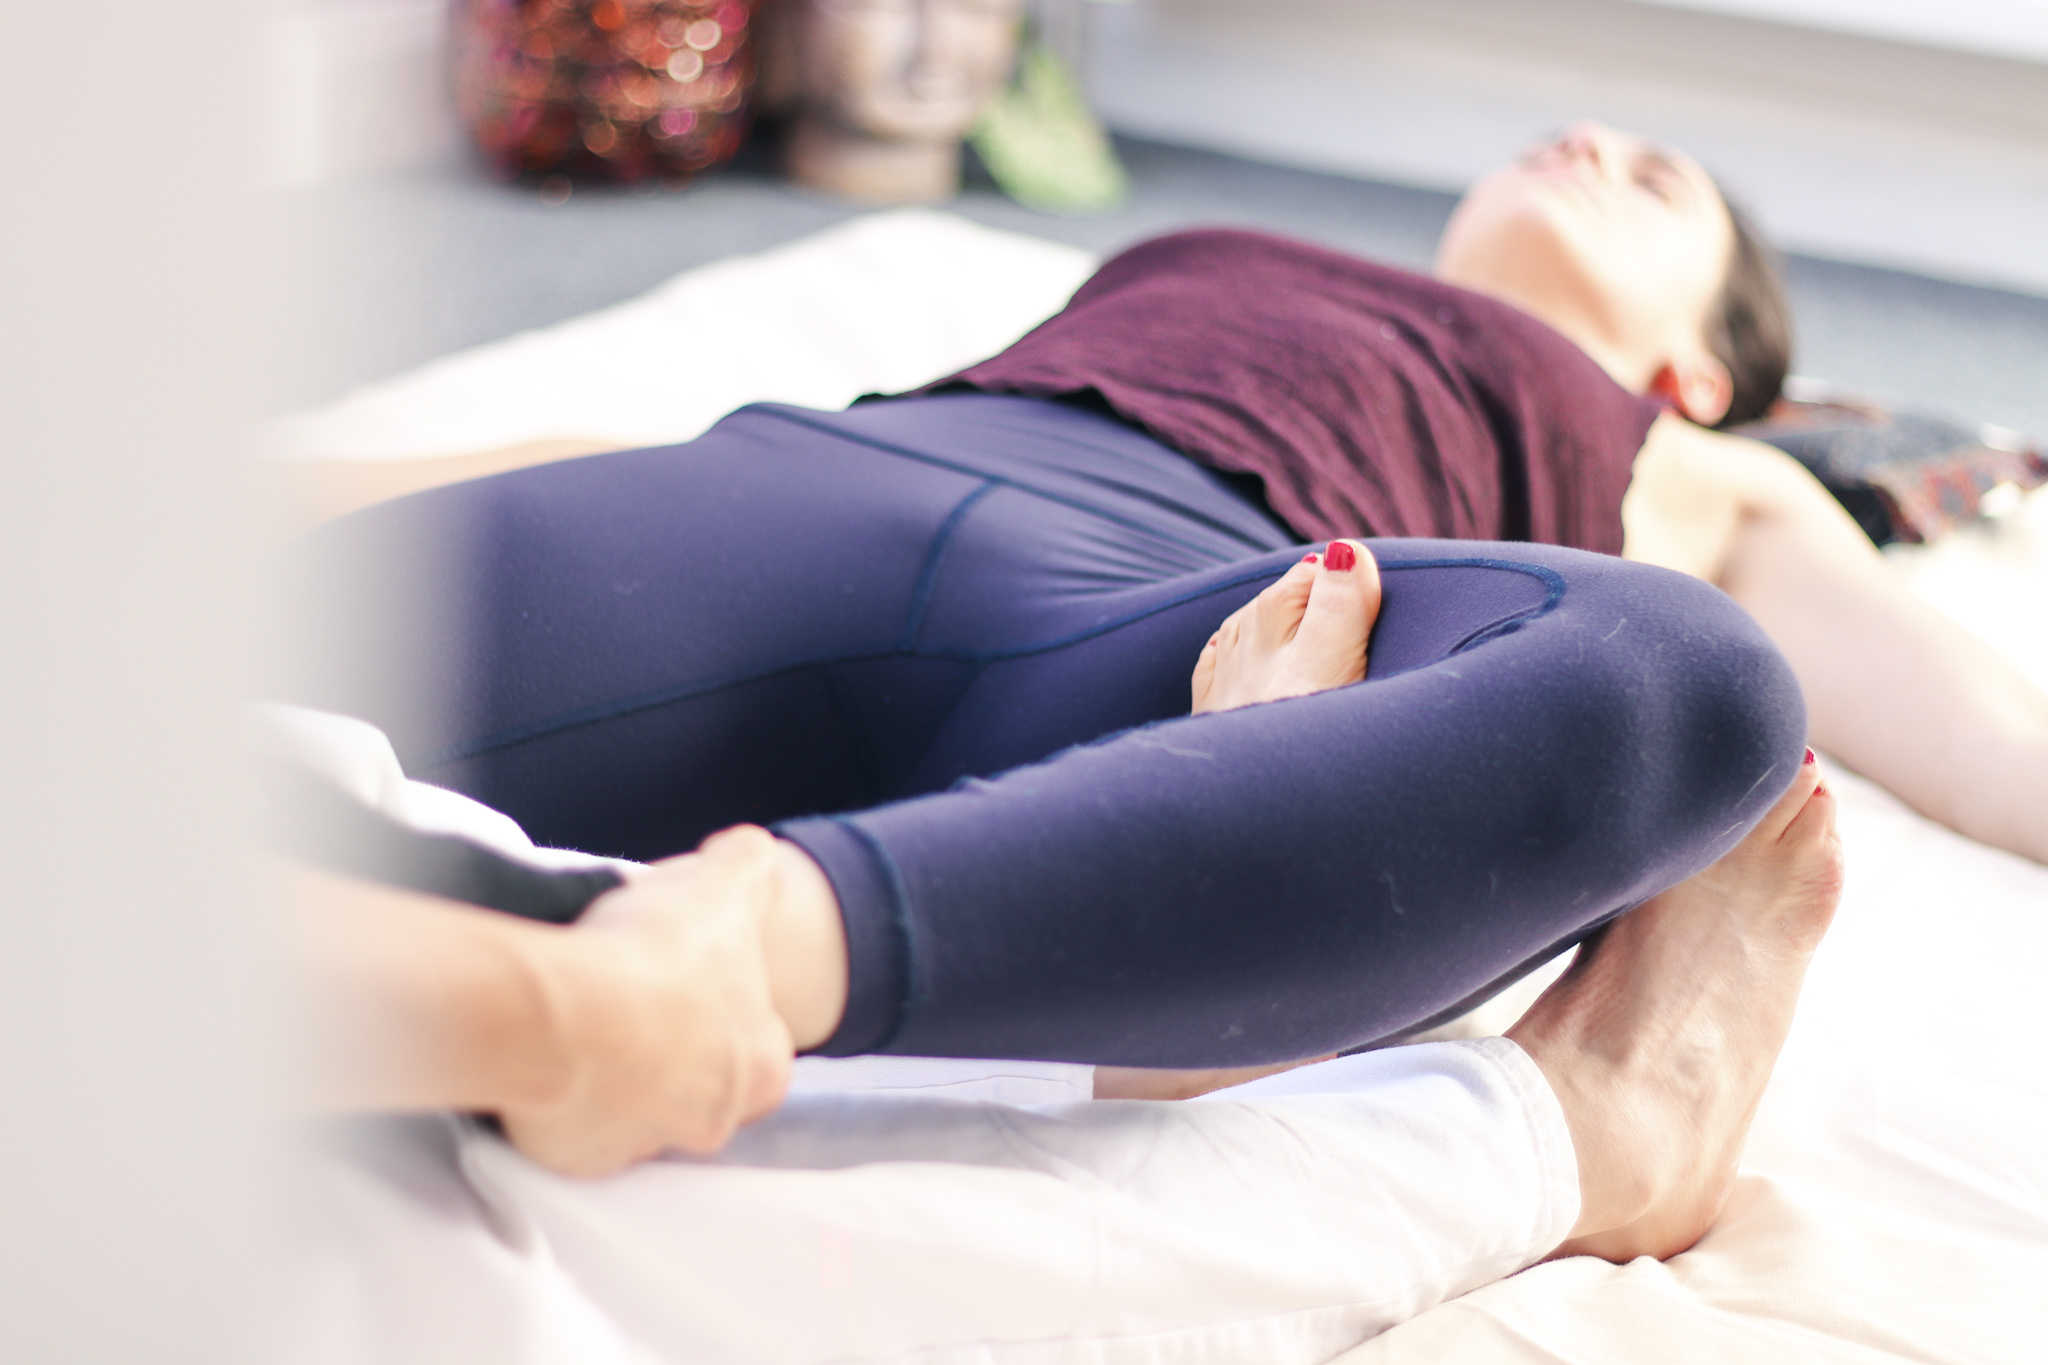 Hands and Heart Oct 2018 - Thai Massage - Rowanne (19).jpg